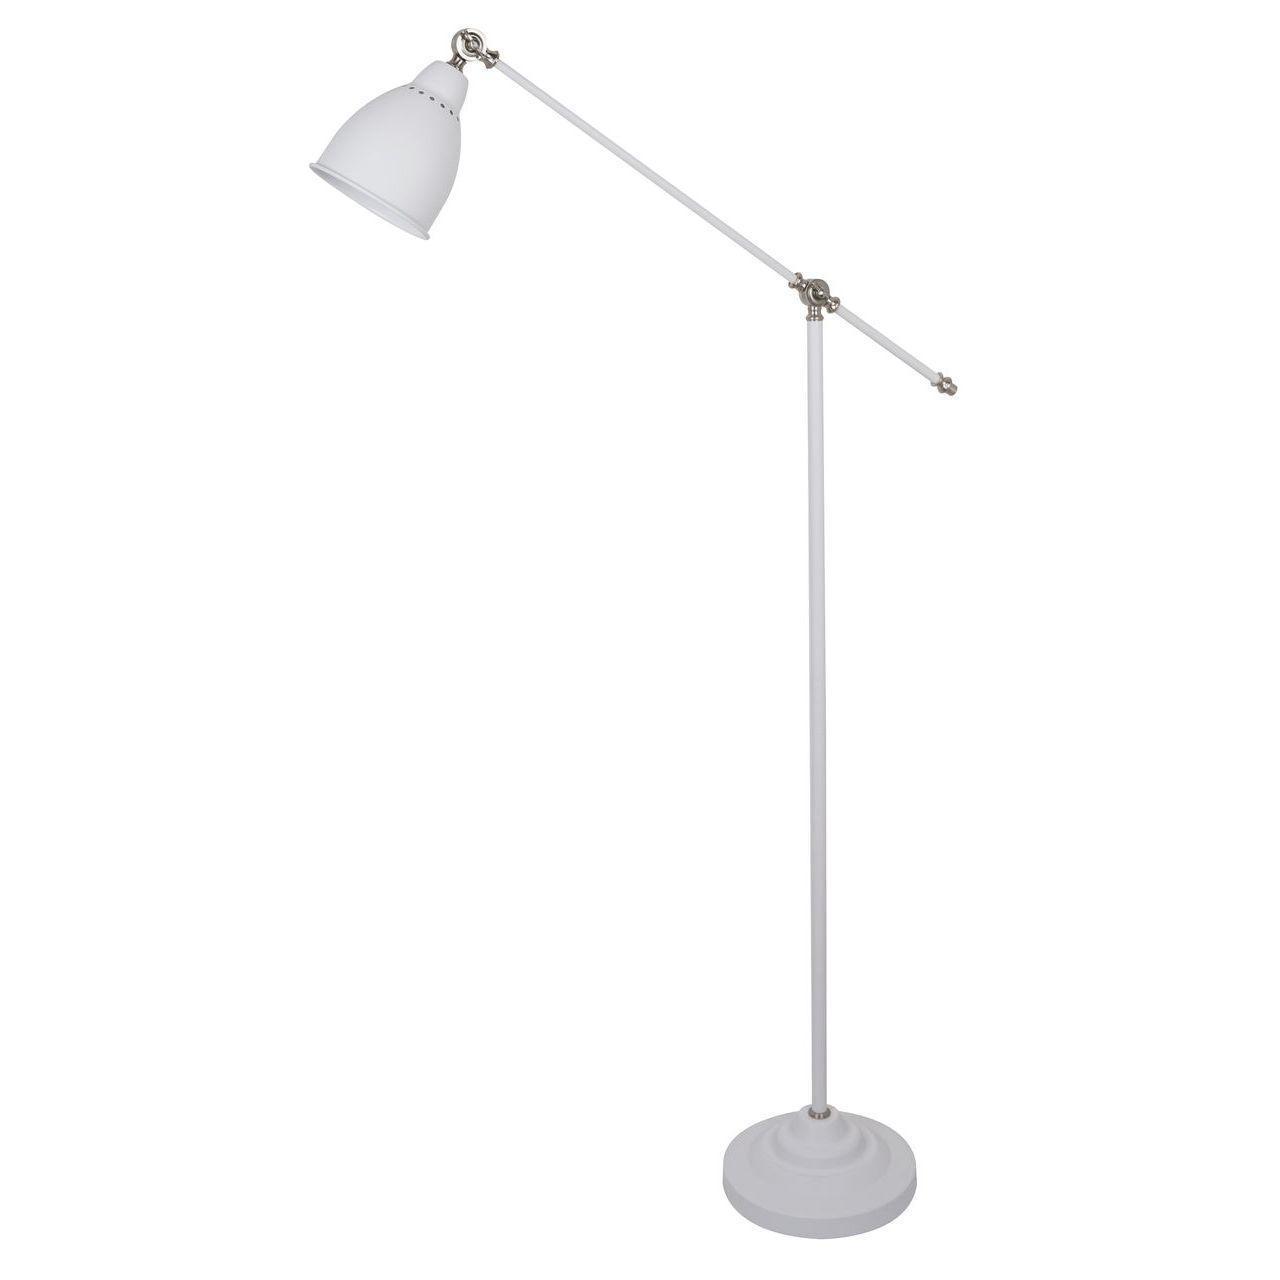 Торшер Arte Lamp Braccio A2054PN-1WH недорого